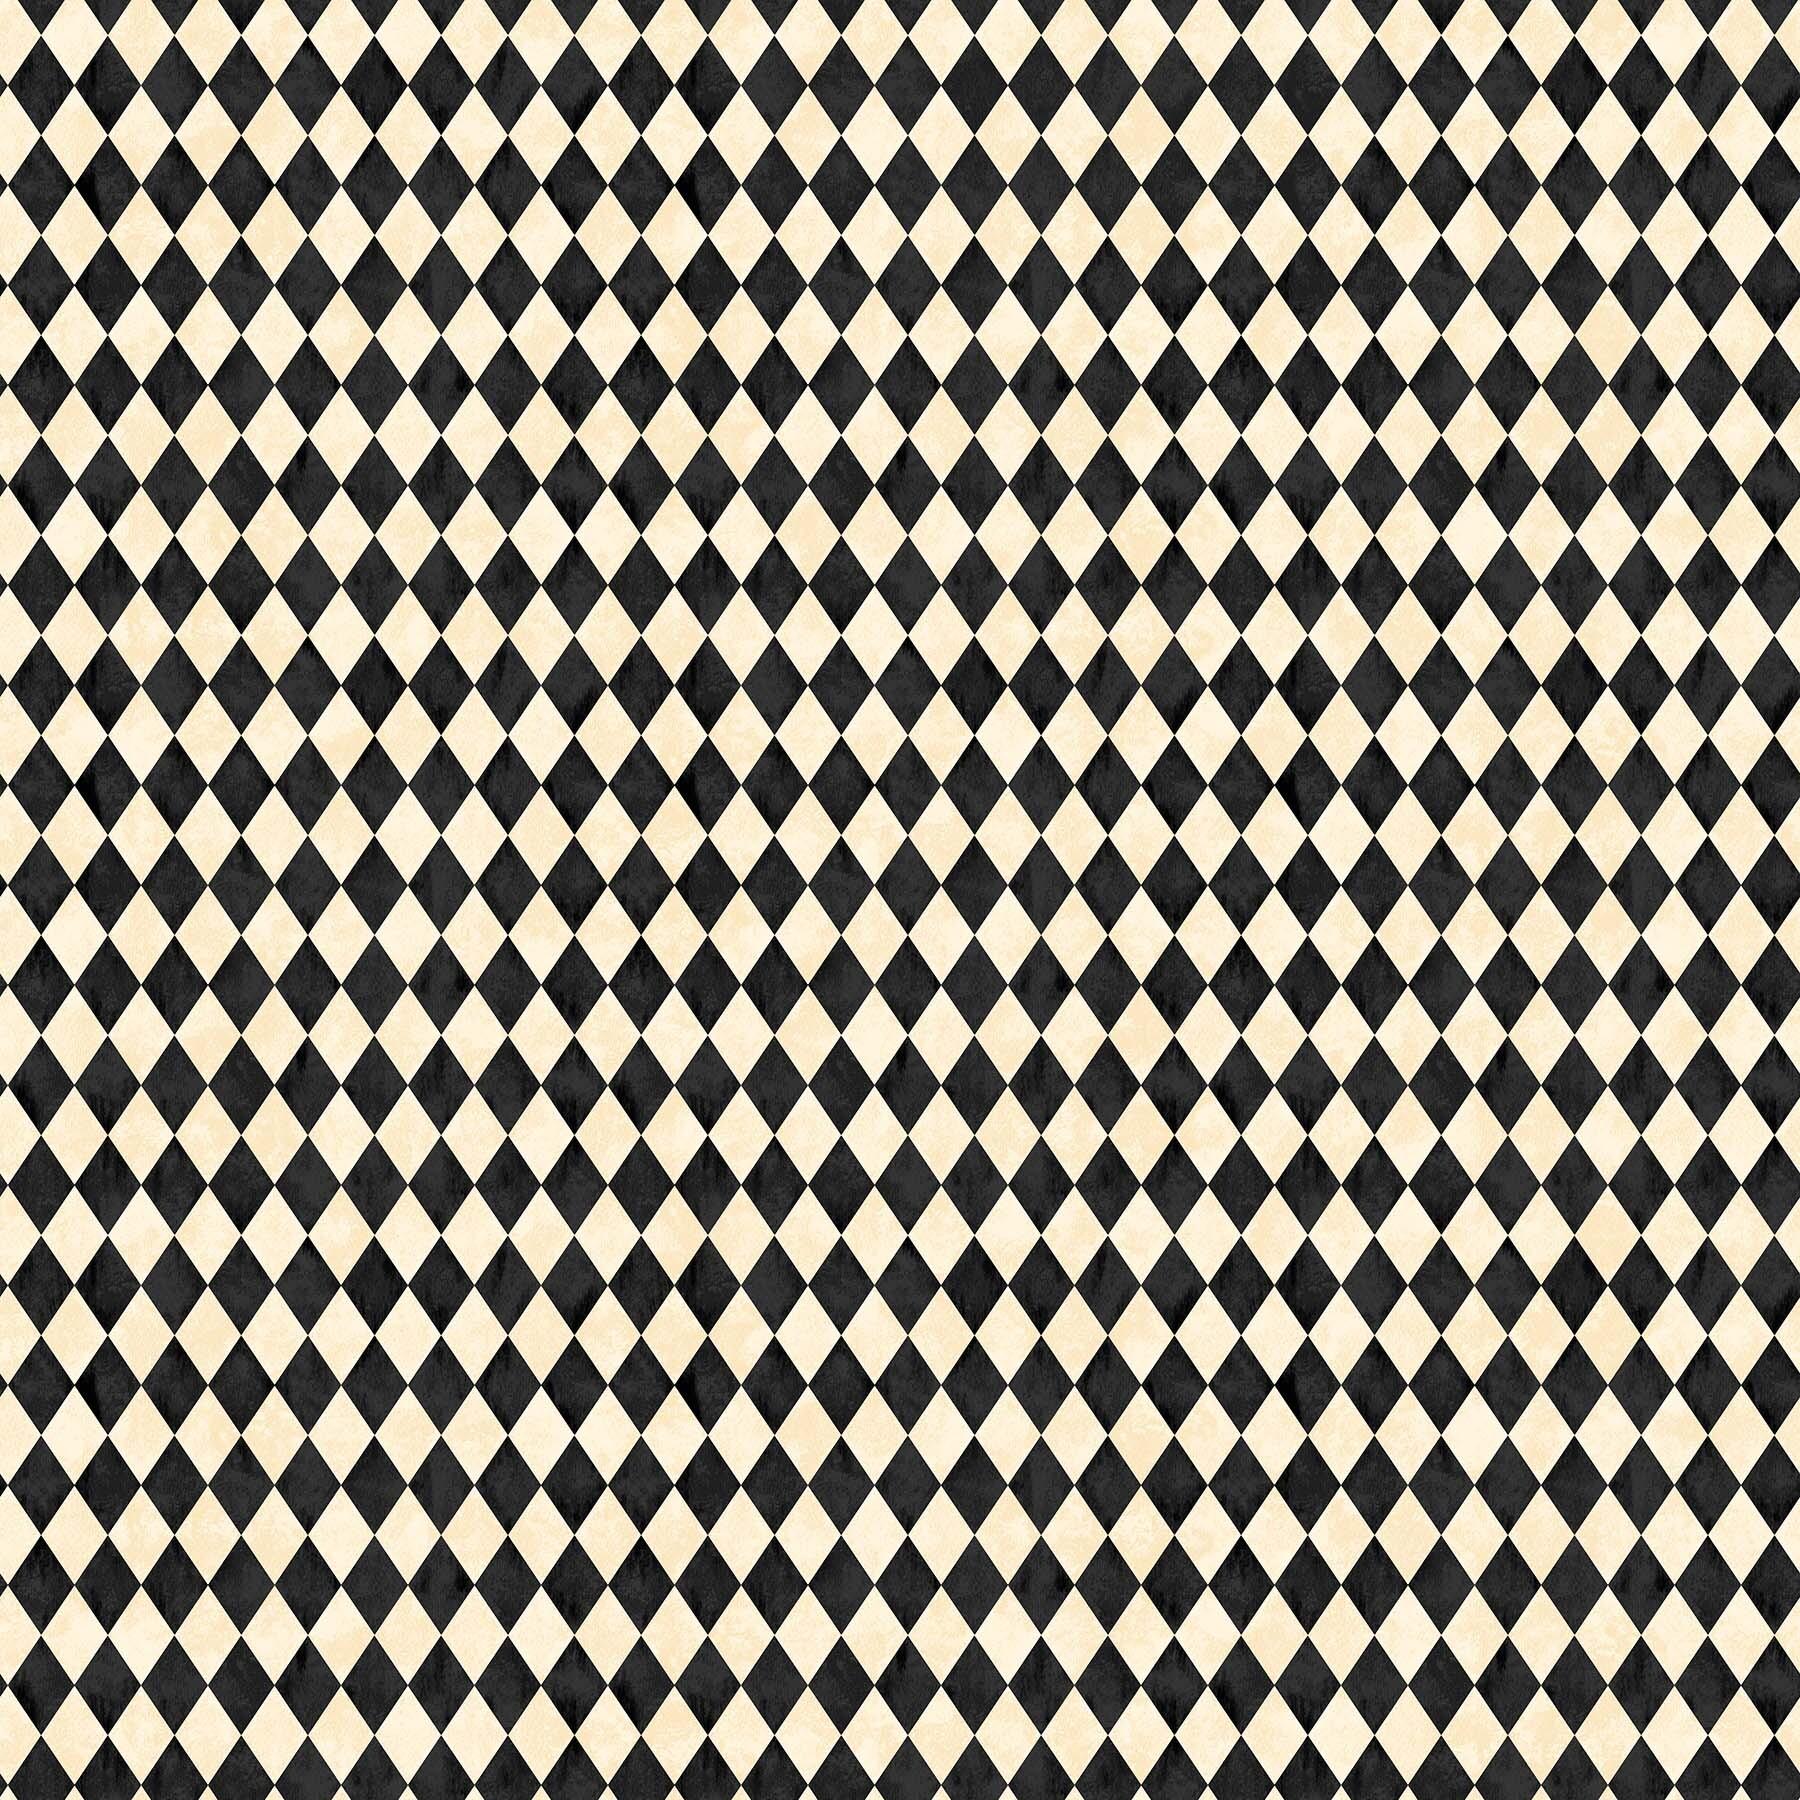 Black Cat Capers - Cream and Black Checkered - 1/2m cut 57892